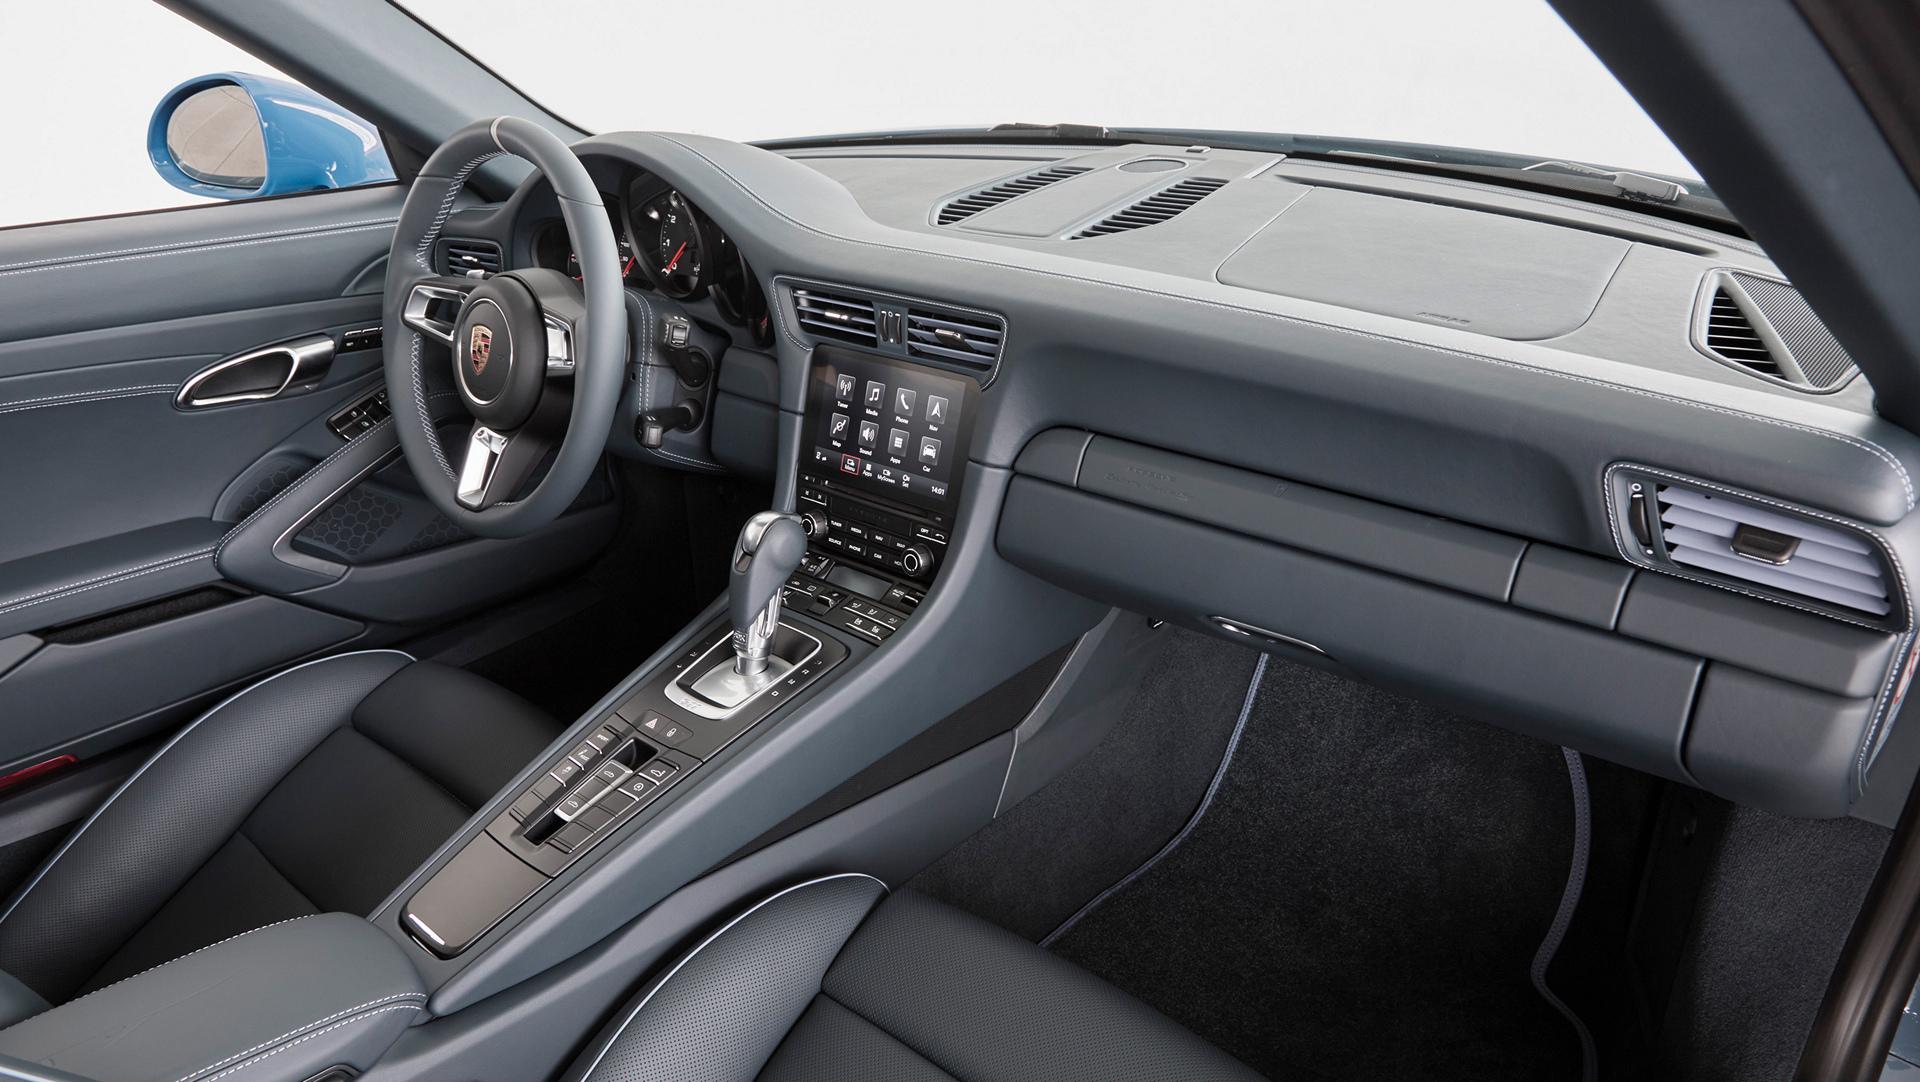 911 Targa 4S Exclusive Design Edition © Dr. Ing. h.c. F. Porsche AG